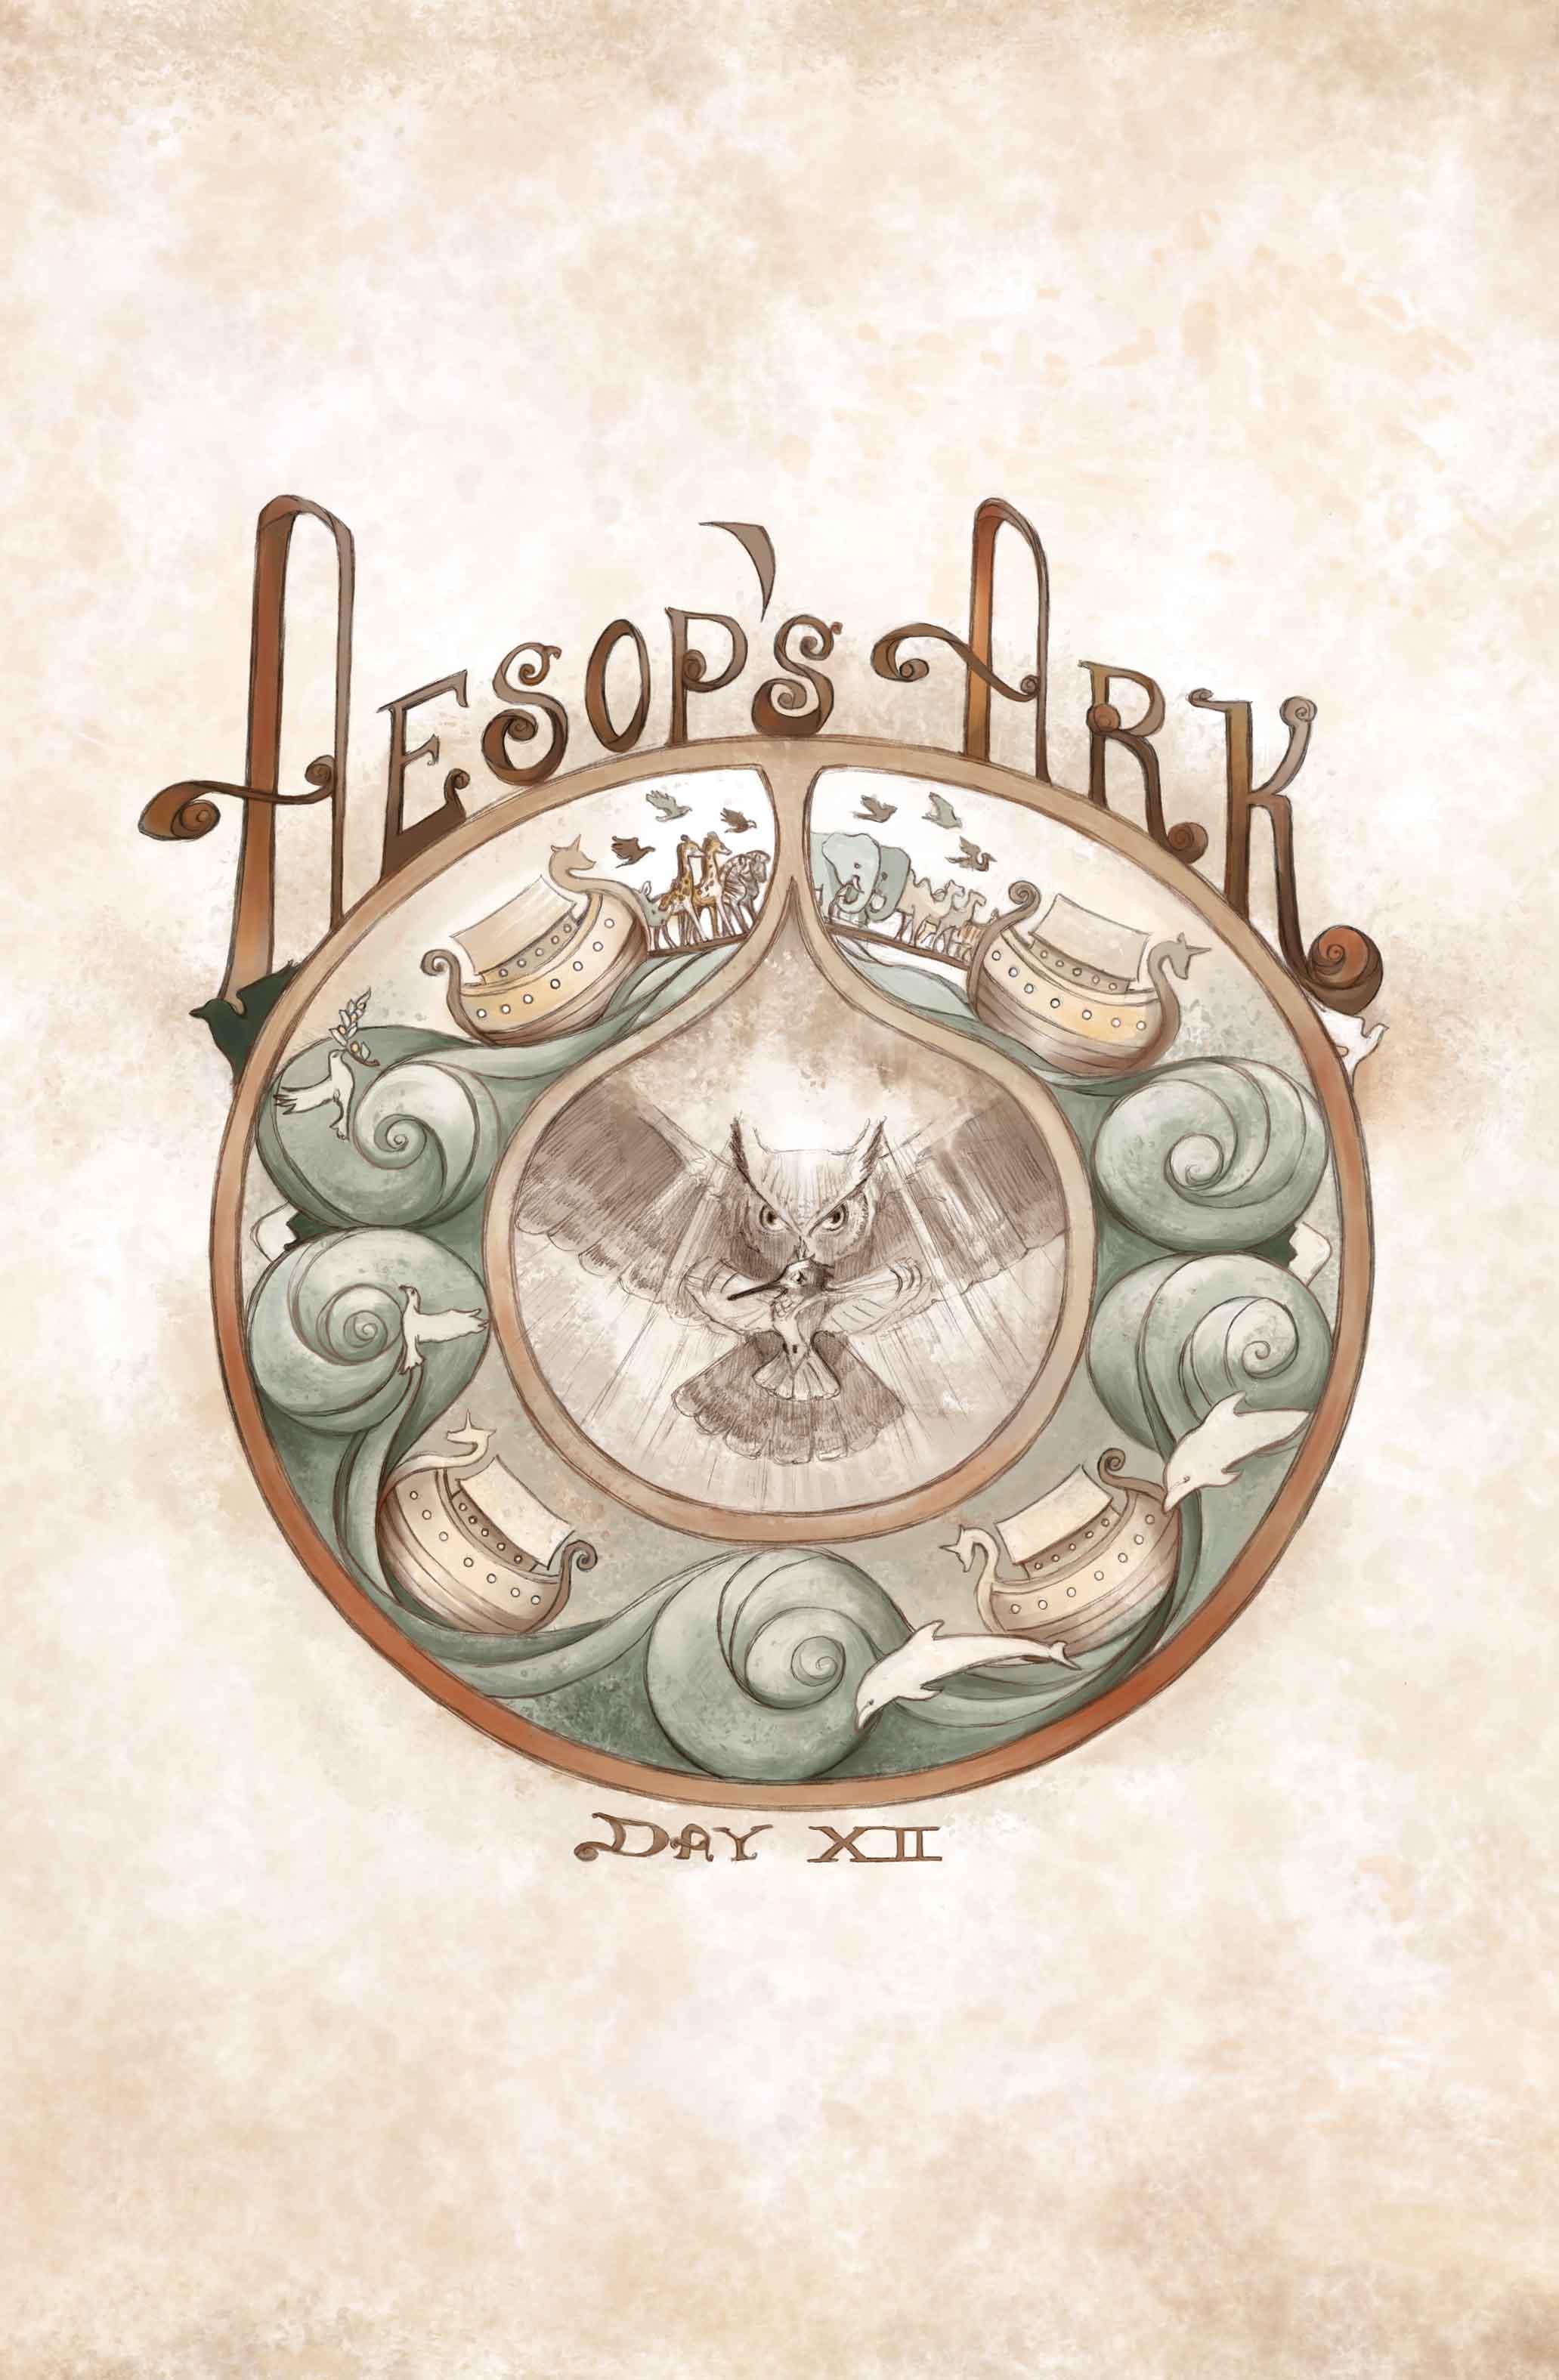 Aesops_Ark_2_01